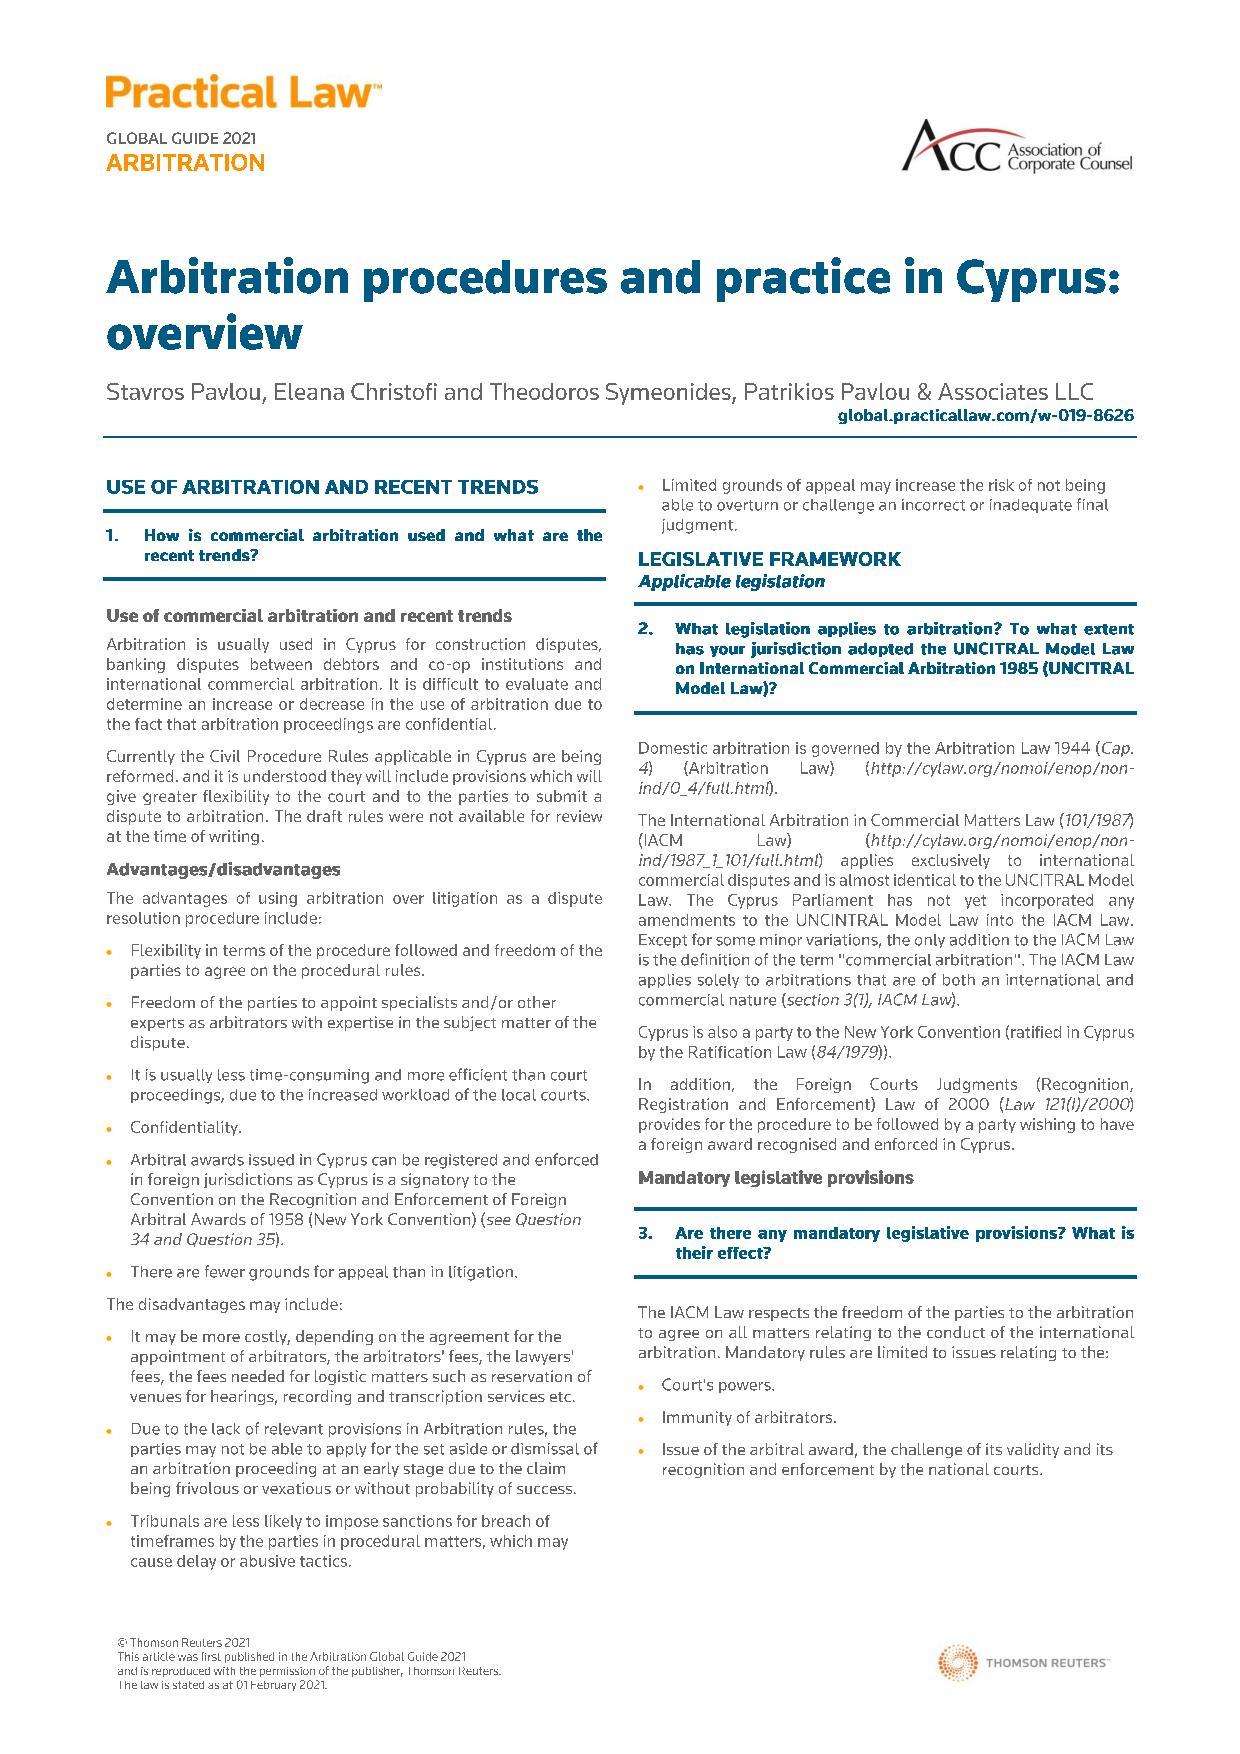 Patrikios Pavlou & Associates LLC: Arbitration procedures and practice in Cyprus: overview